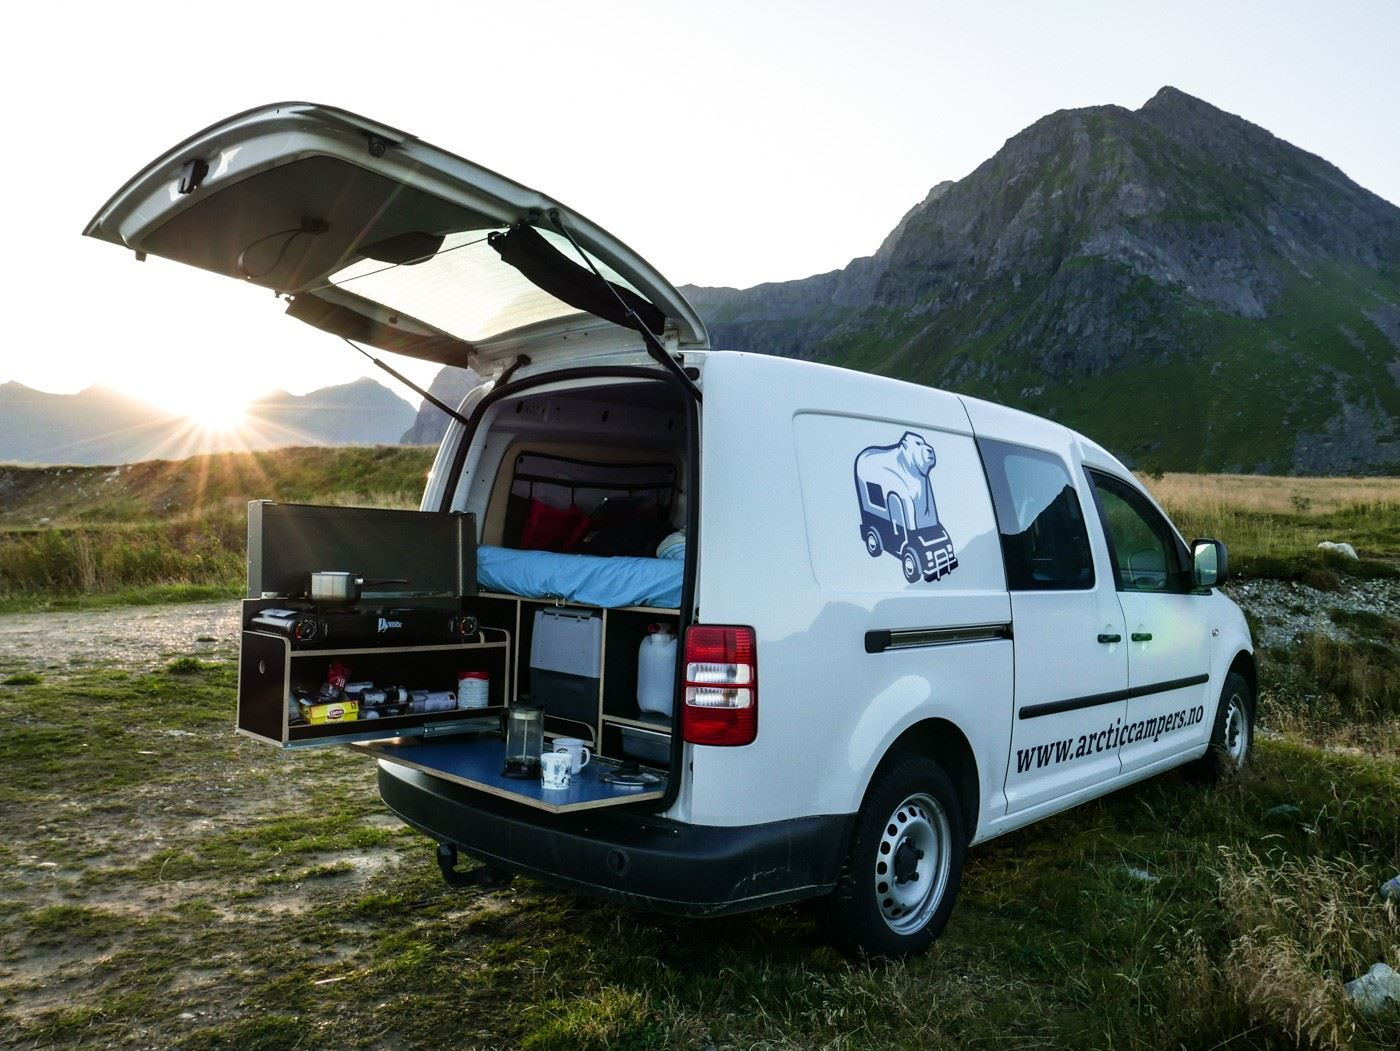 Arctic Campers - Camper Van Rental